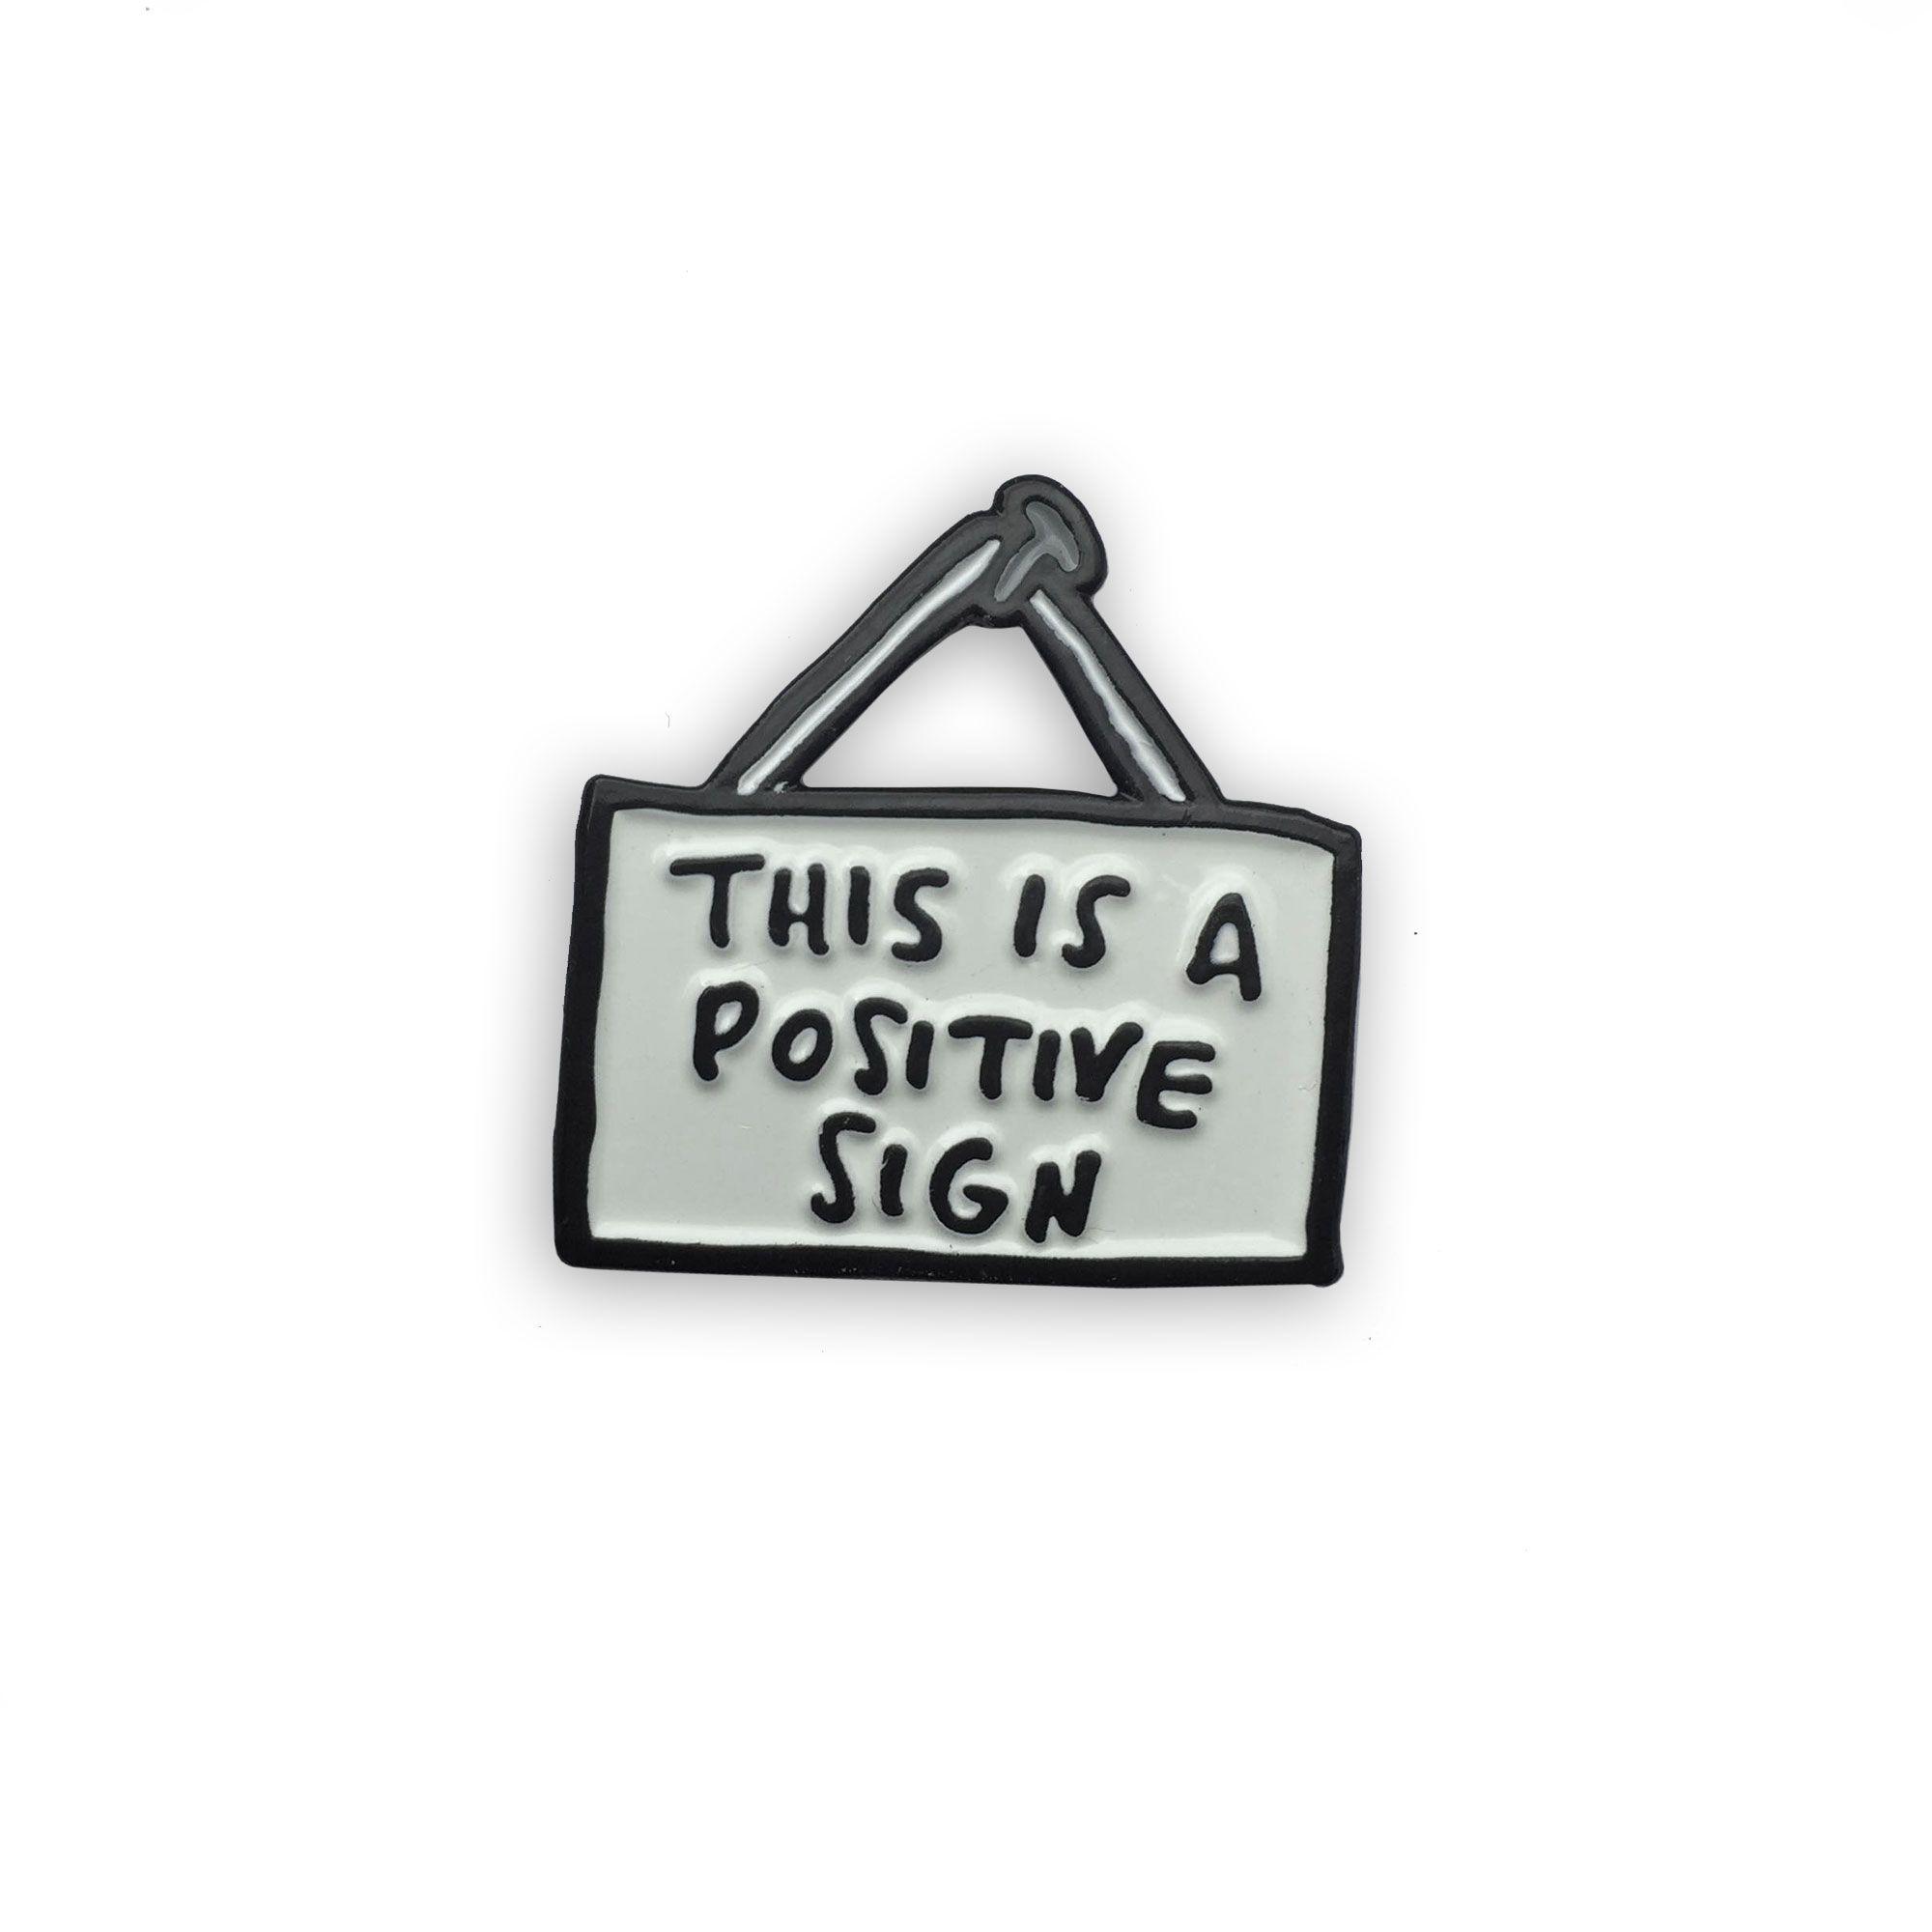 6d8ae2d32ea6 This Is A Positive Sign Enamel Pin | Enamel Pins | Lapel pins ...